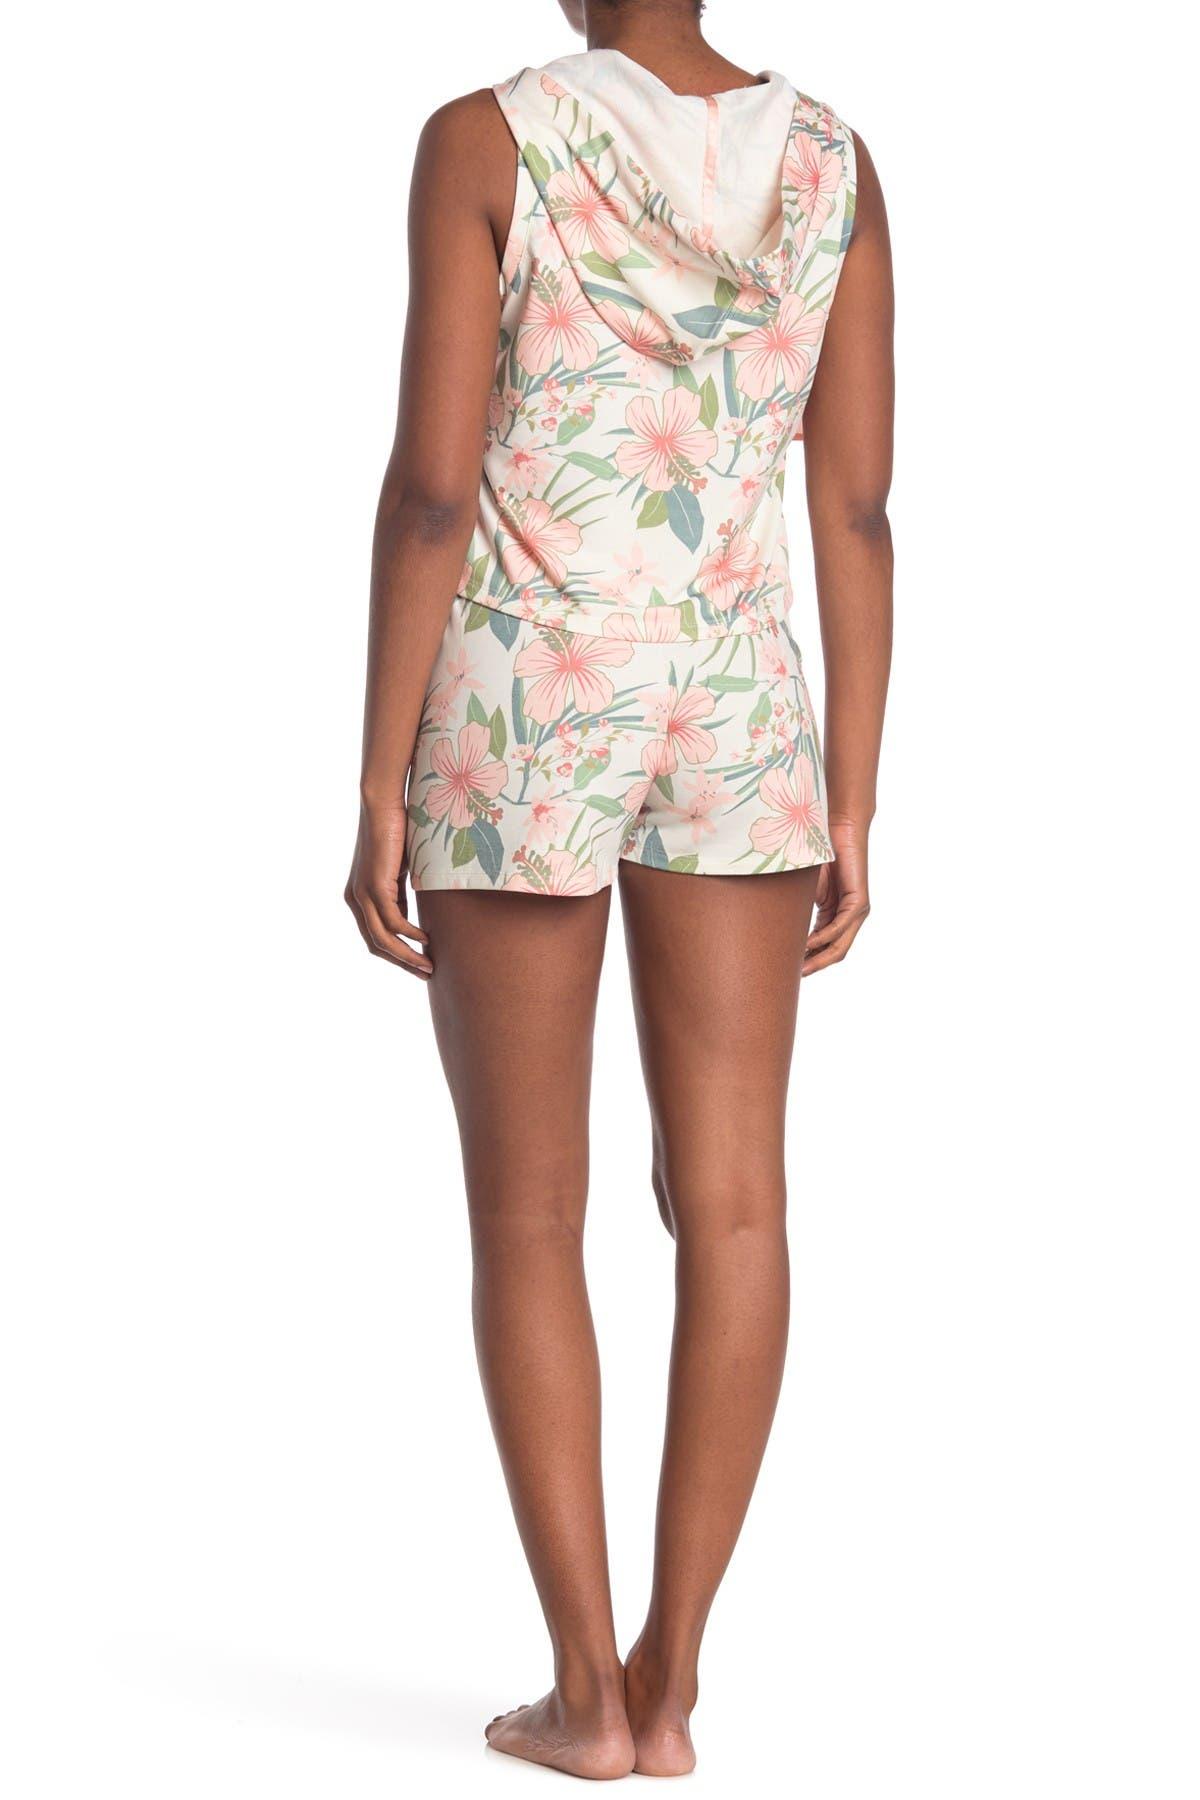 Image of COZY ROZY Vacay Vibes Floral Sleeveless Hoodie & Shorts 2-Piece Pajama Set